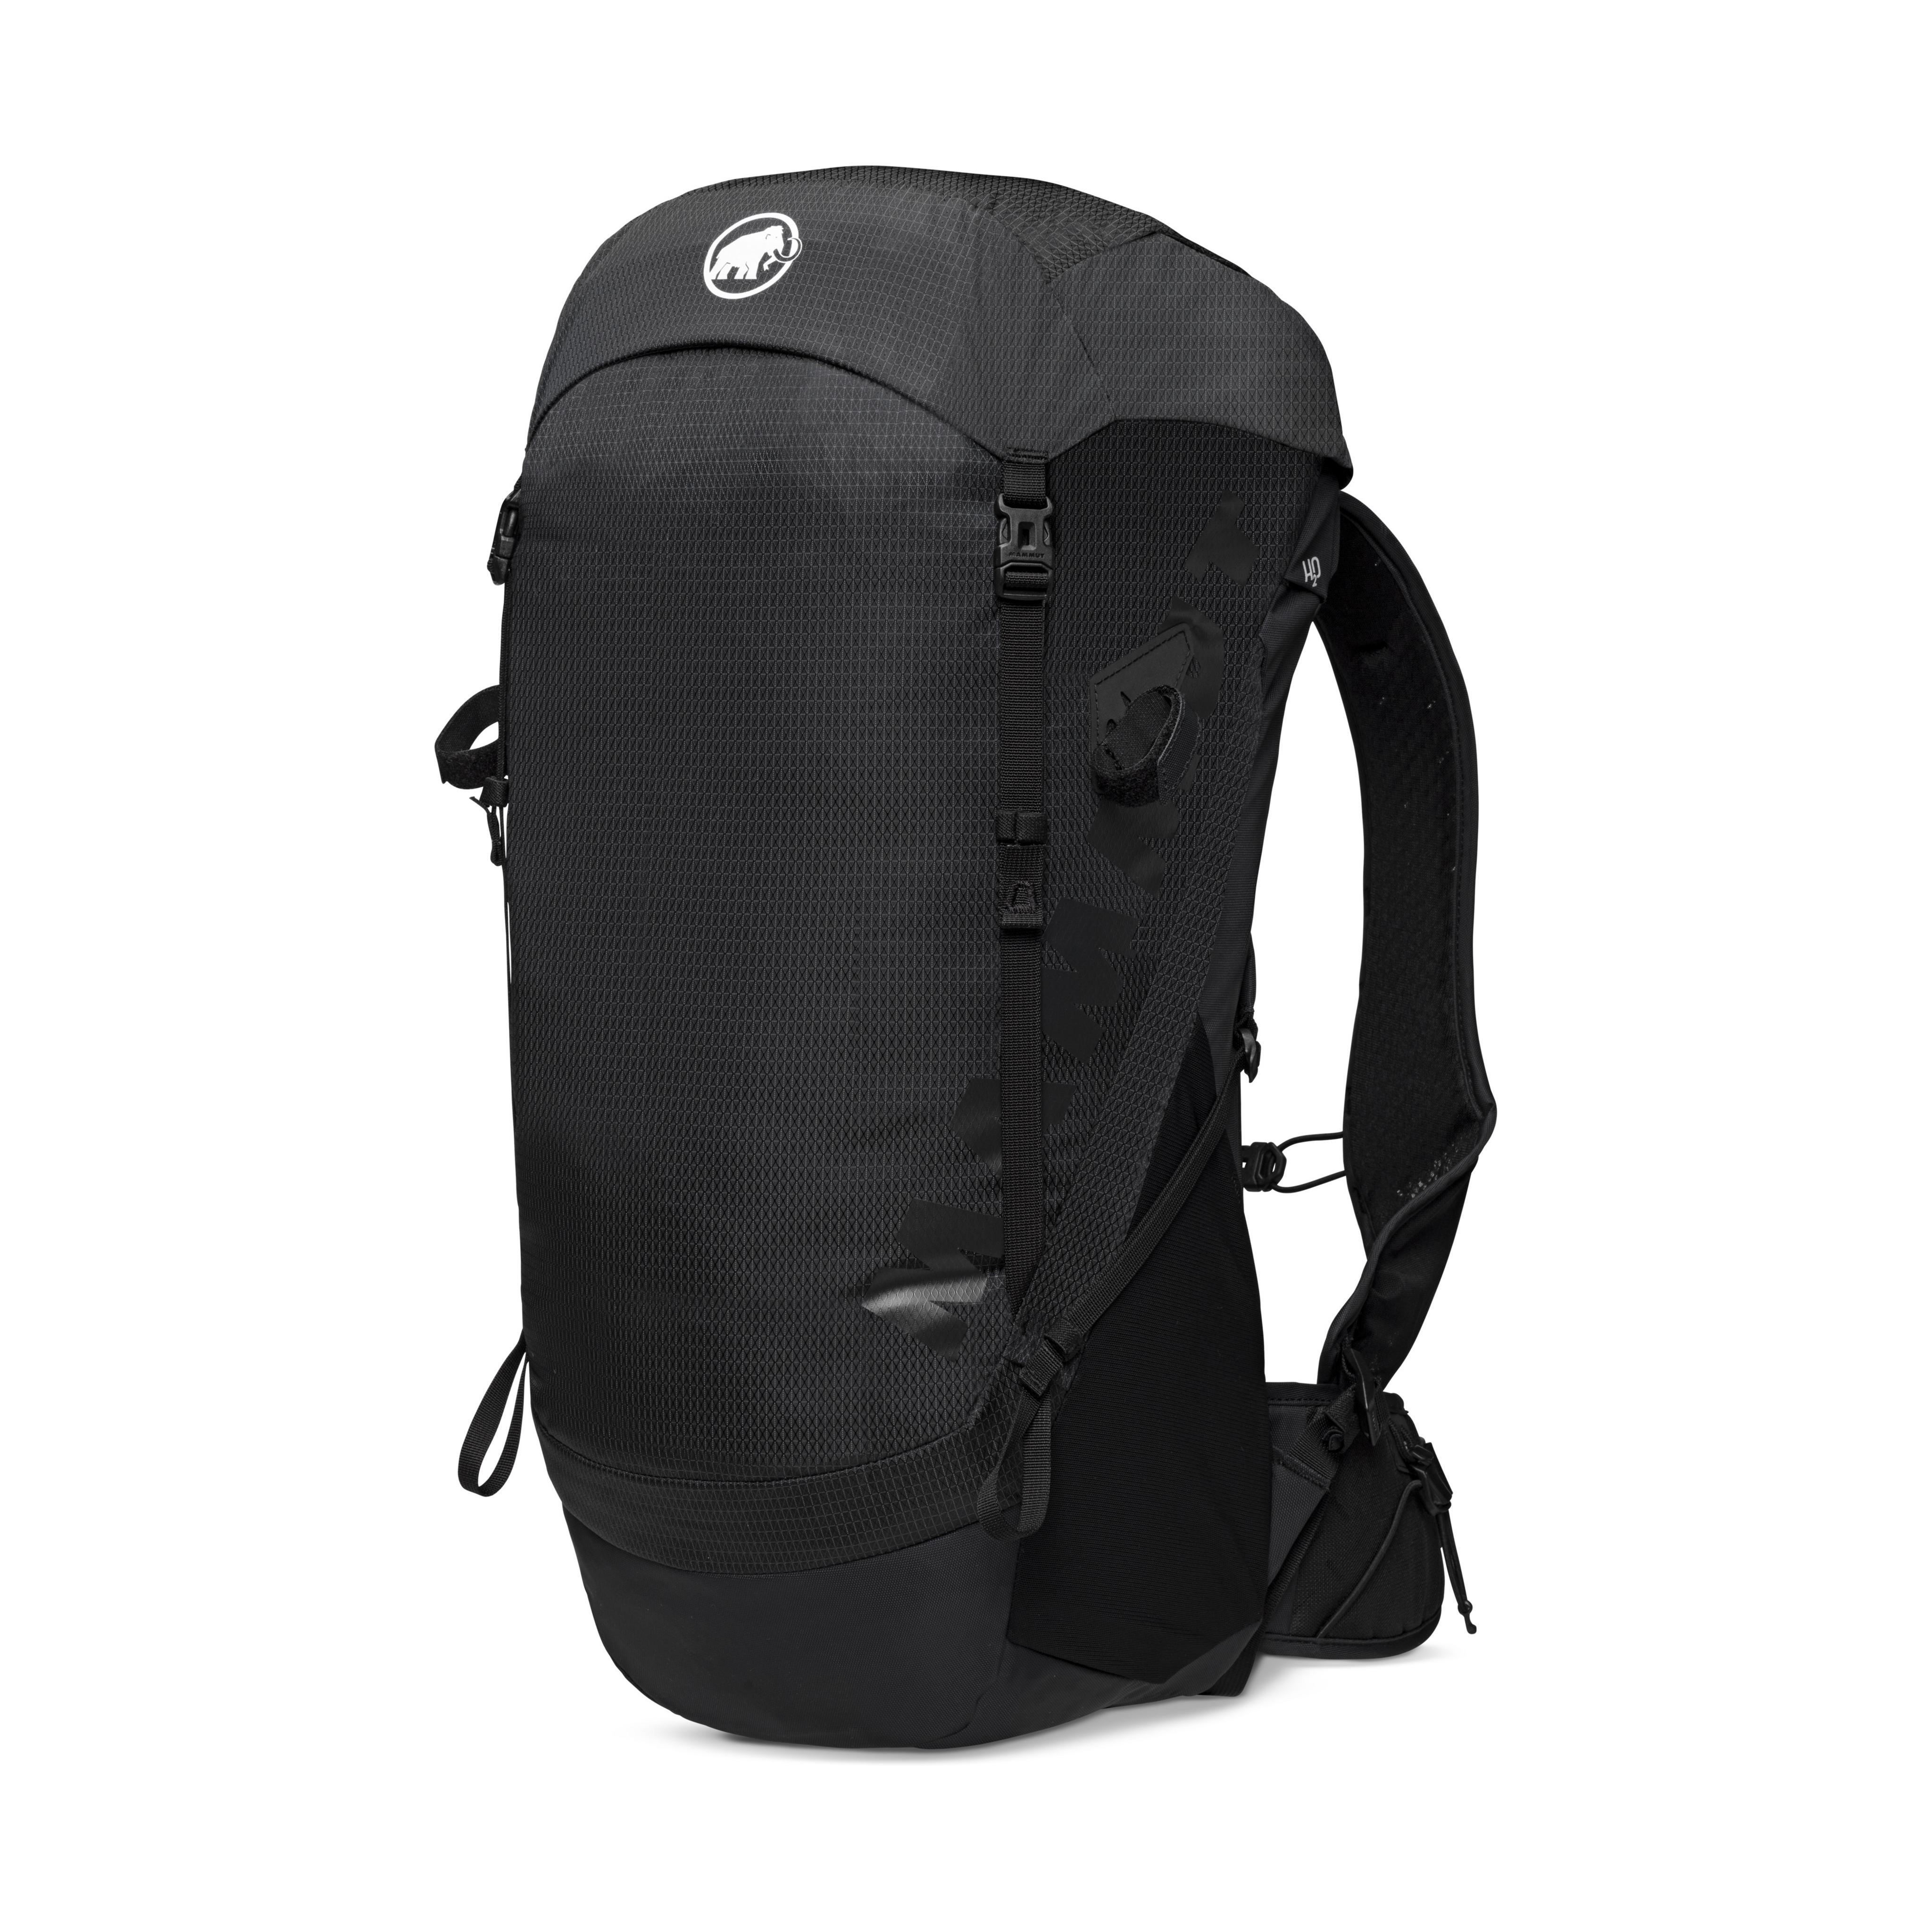 Ducan 24 - 24 L, black product image